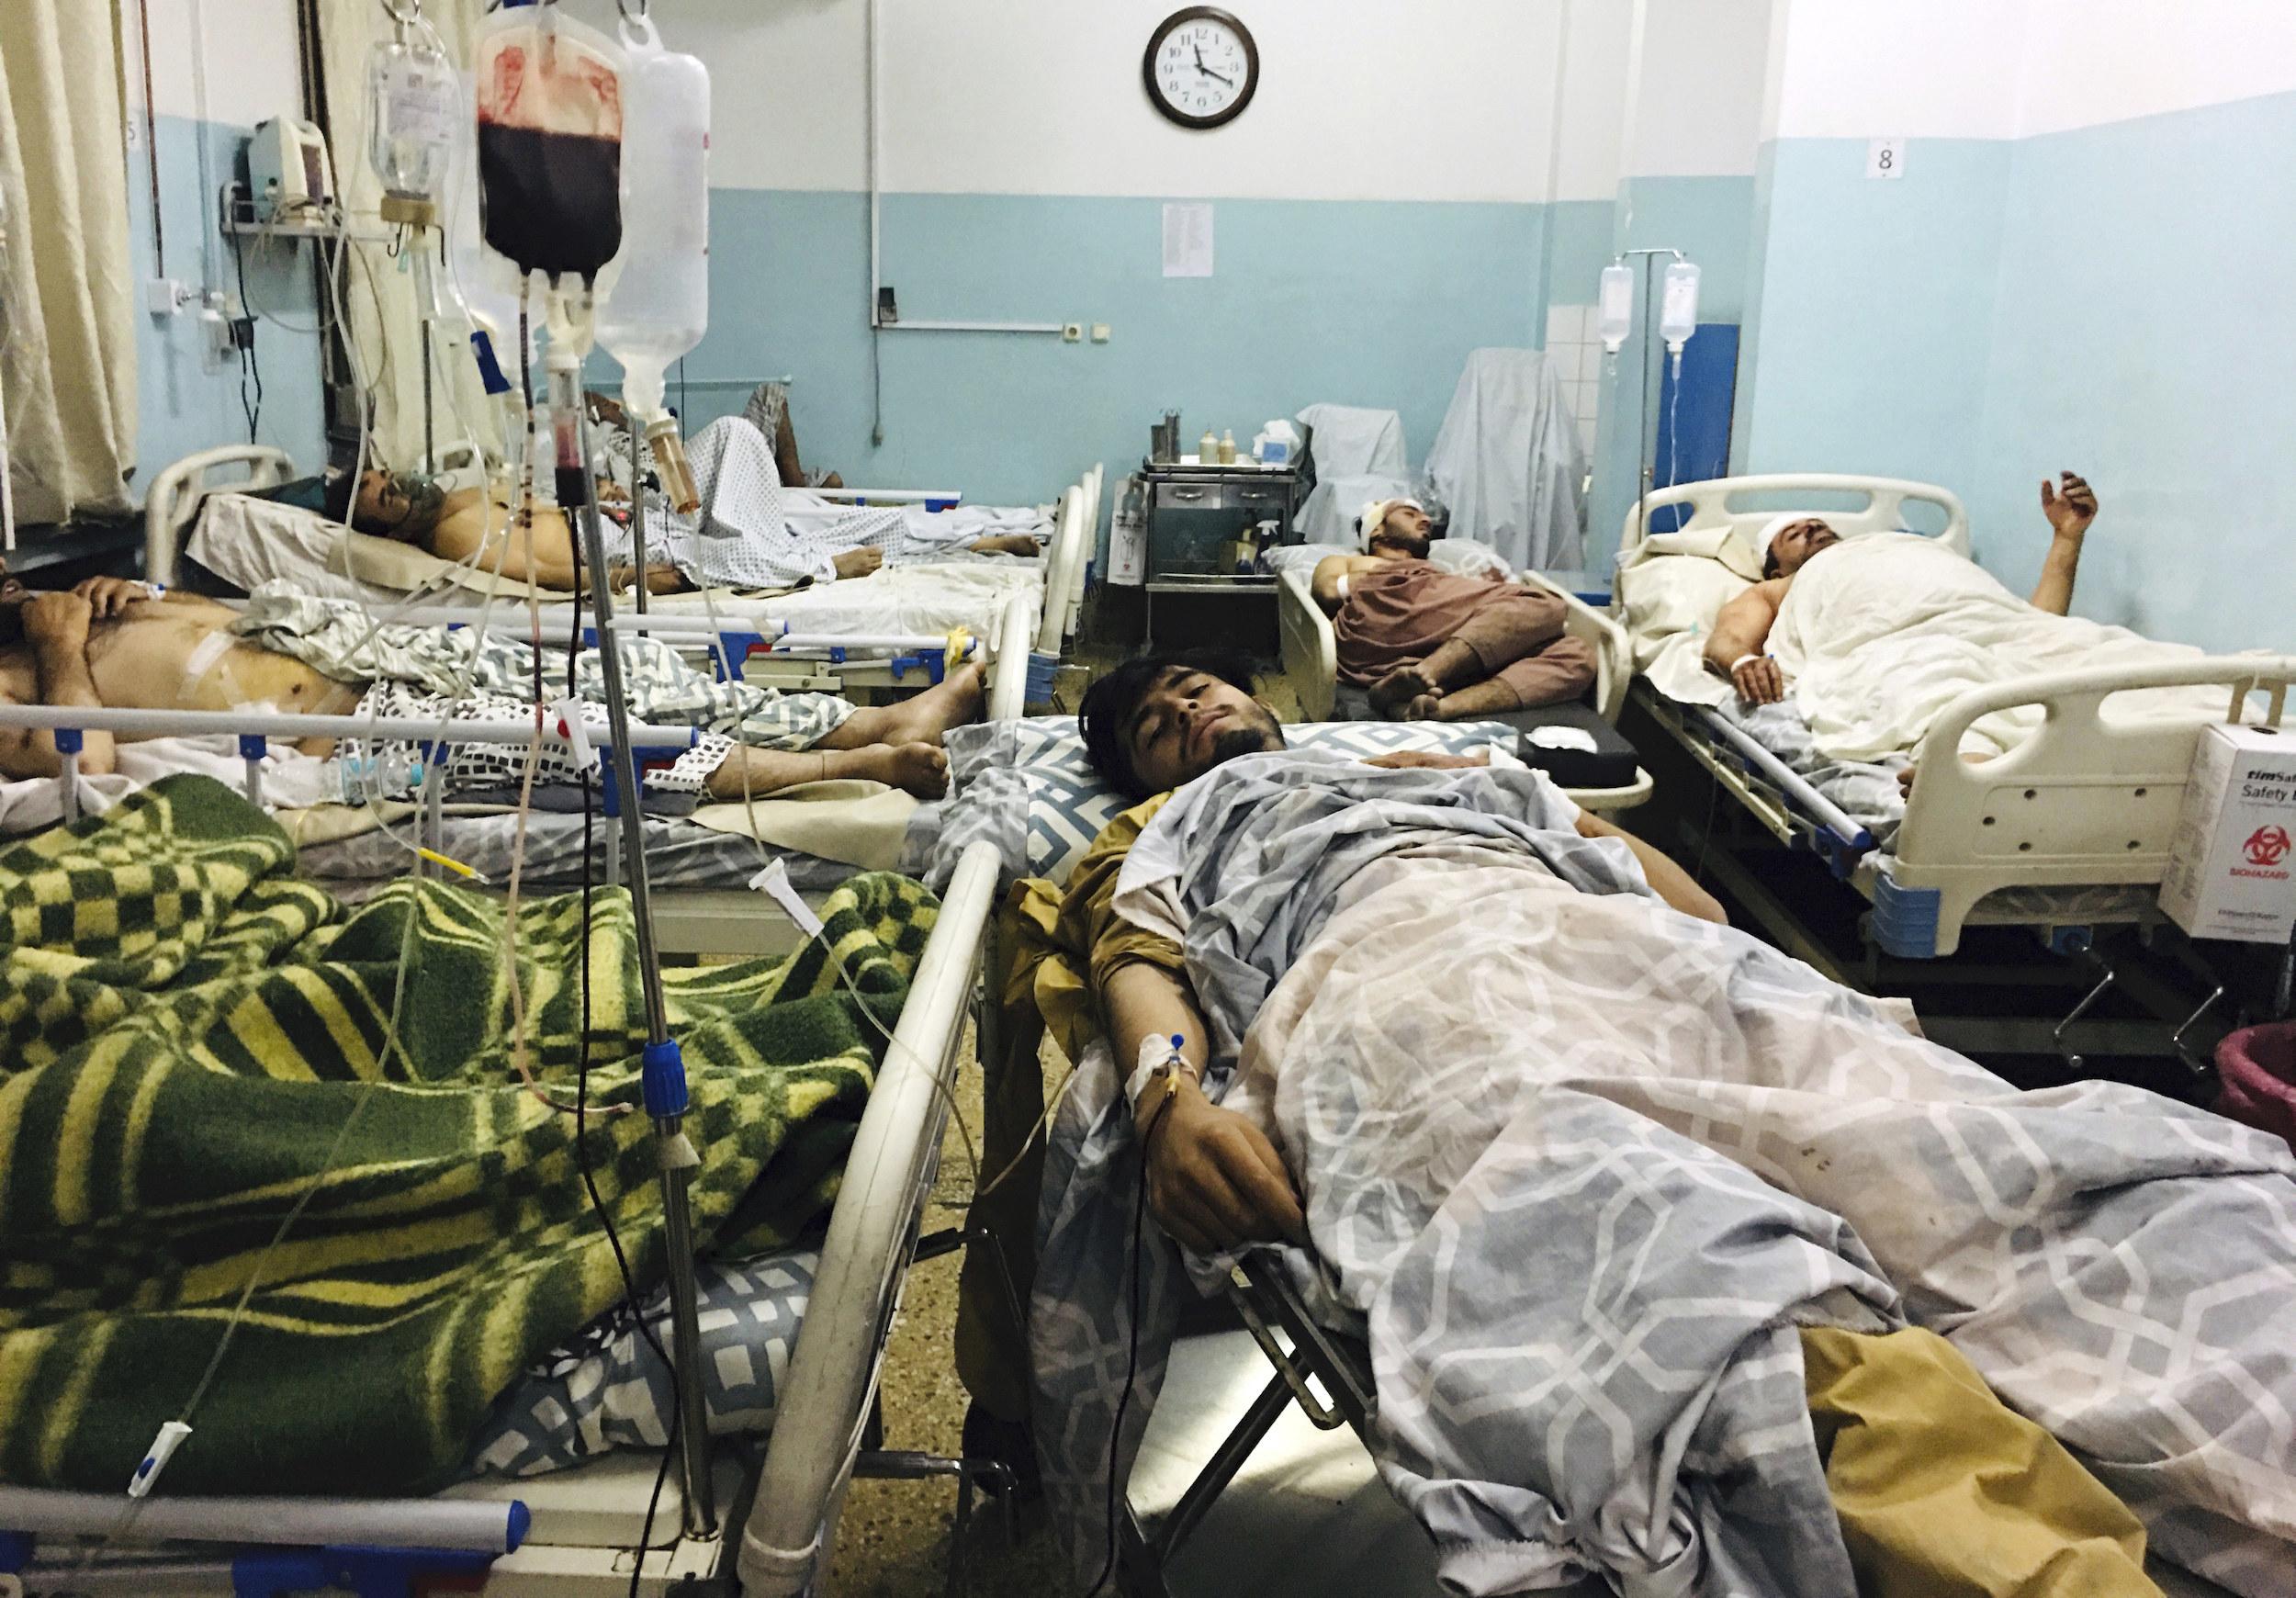 Five wounded men lie in hospital beds